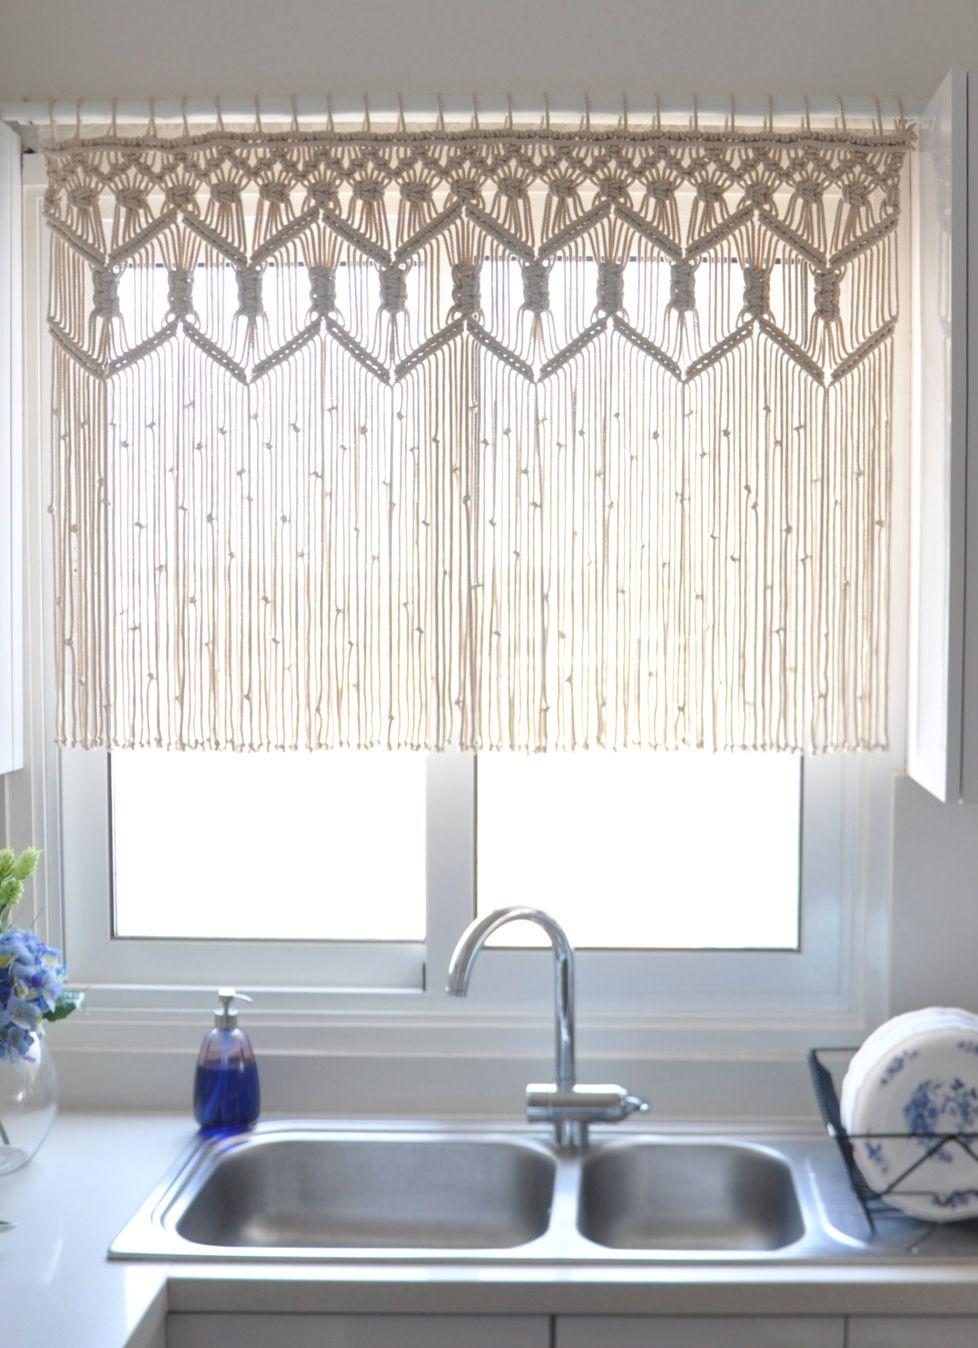 Custom Macrame Curtain Short Kitchen Macrame Wall Hanging